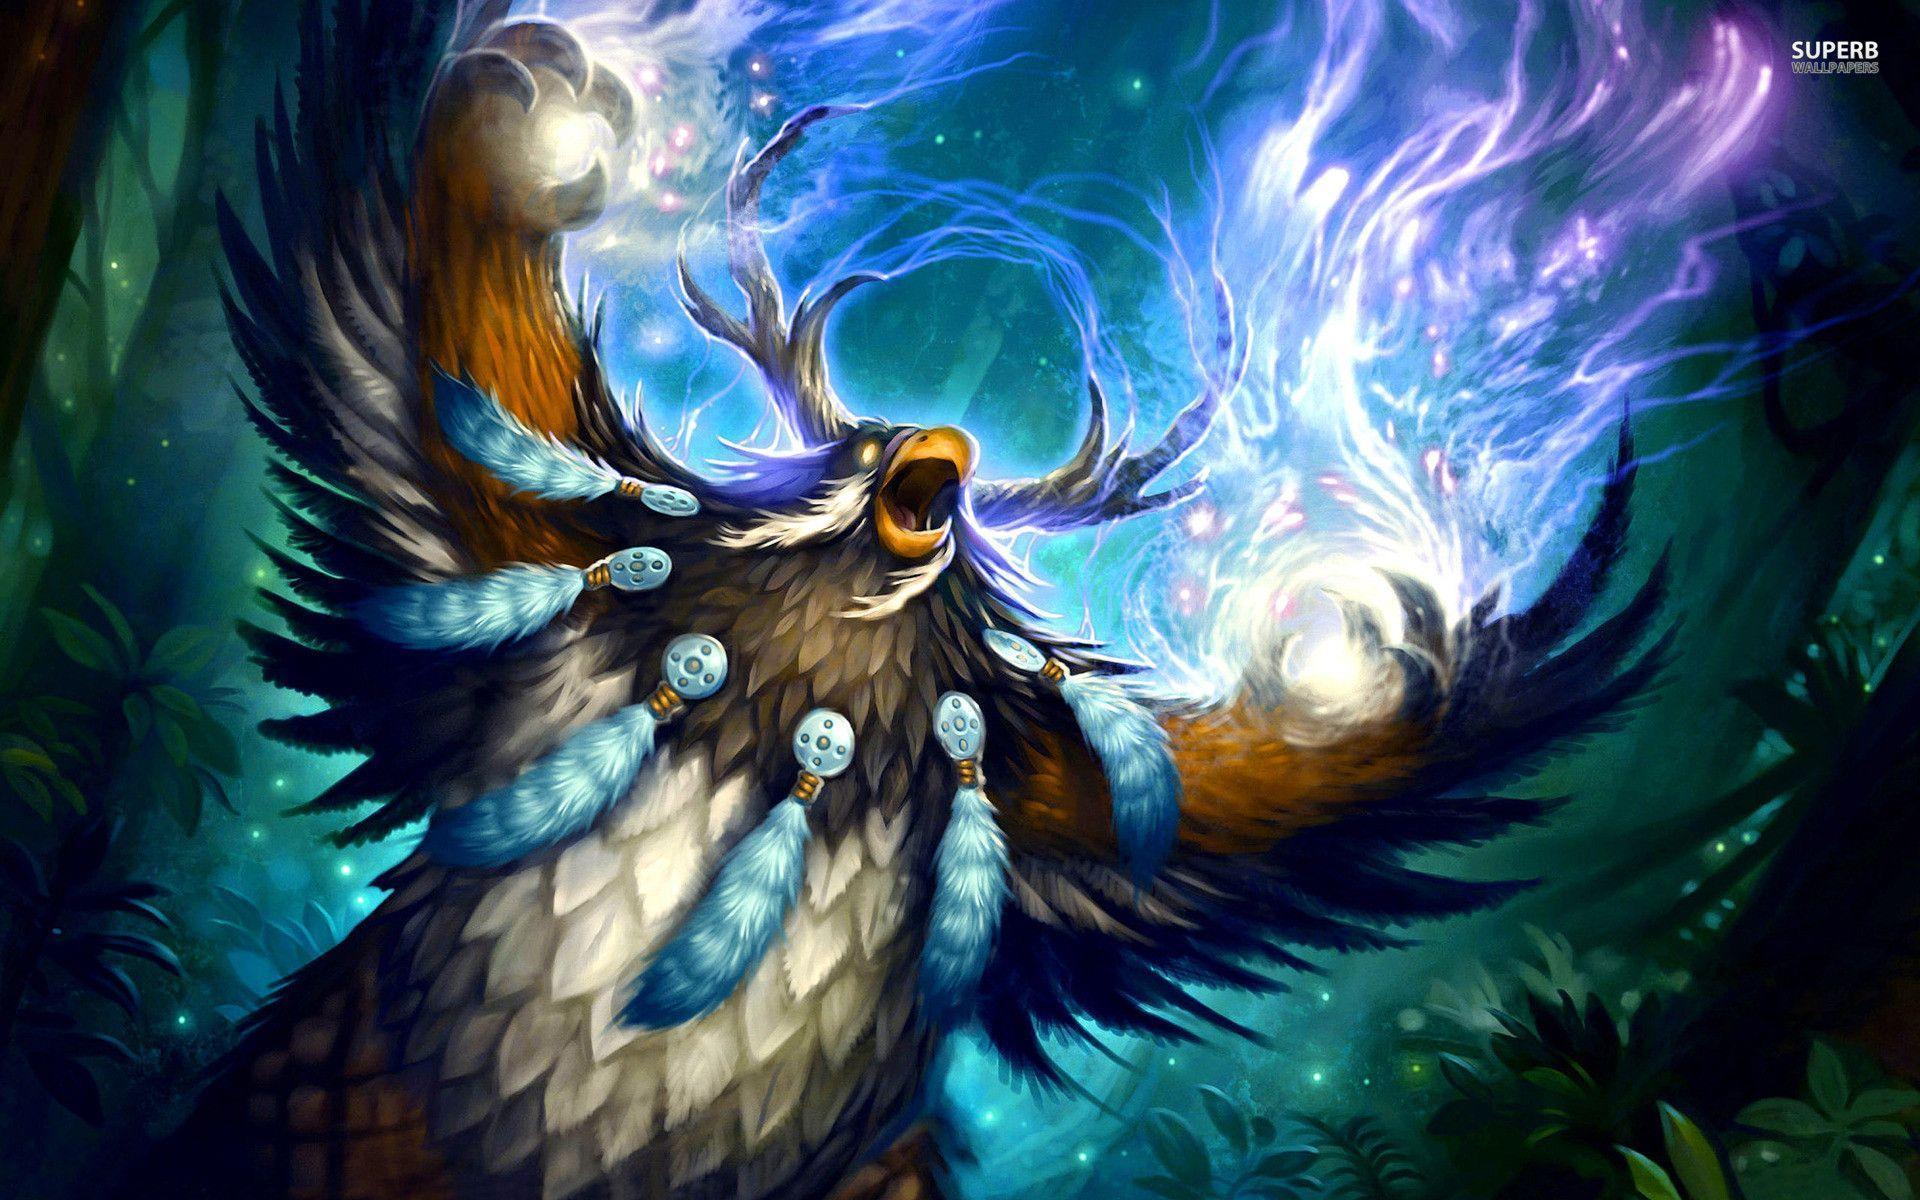 World Of Warcraft wallpaper - 941671